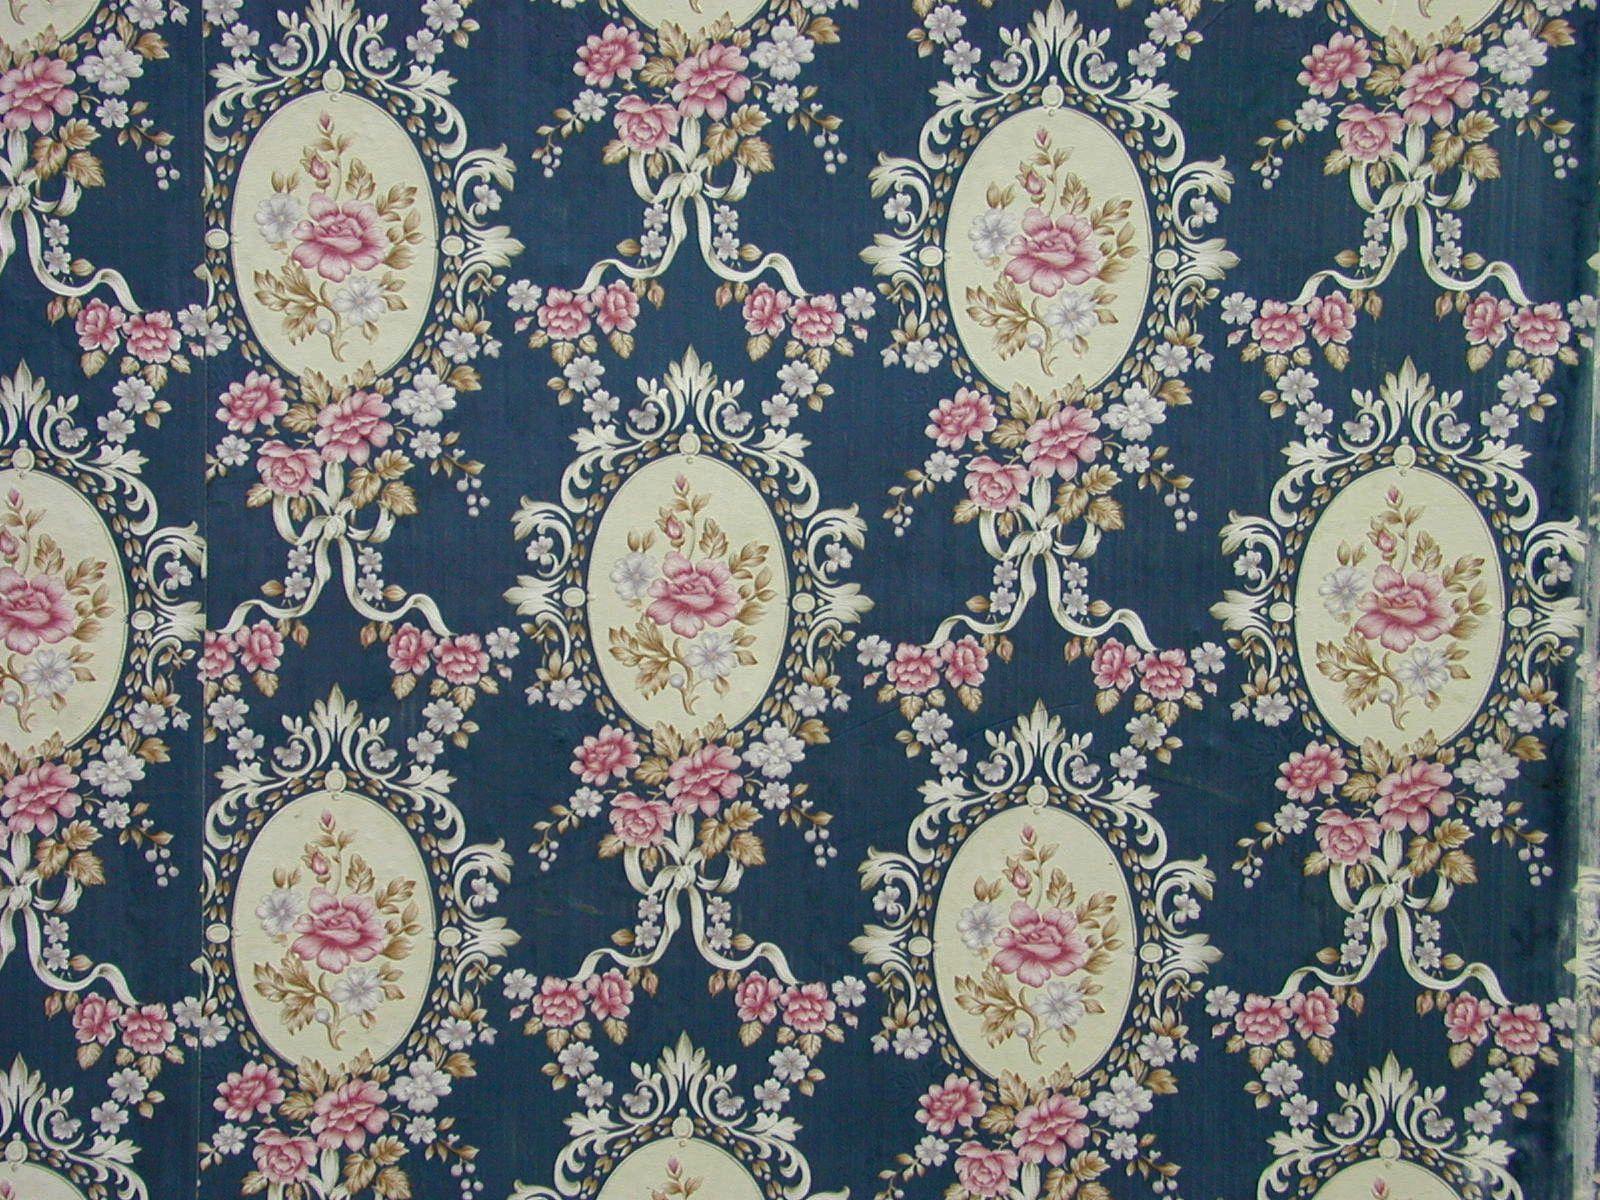 Exhibition: Victorian Wallpaper